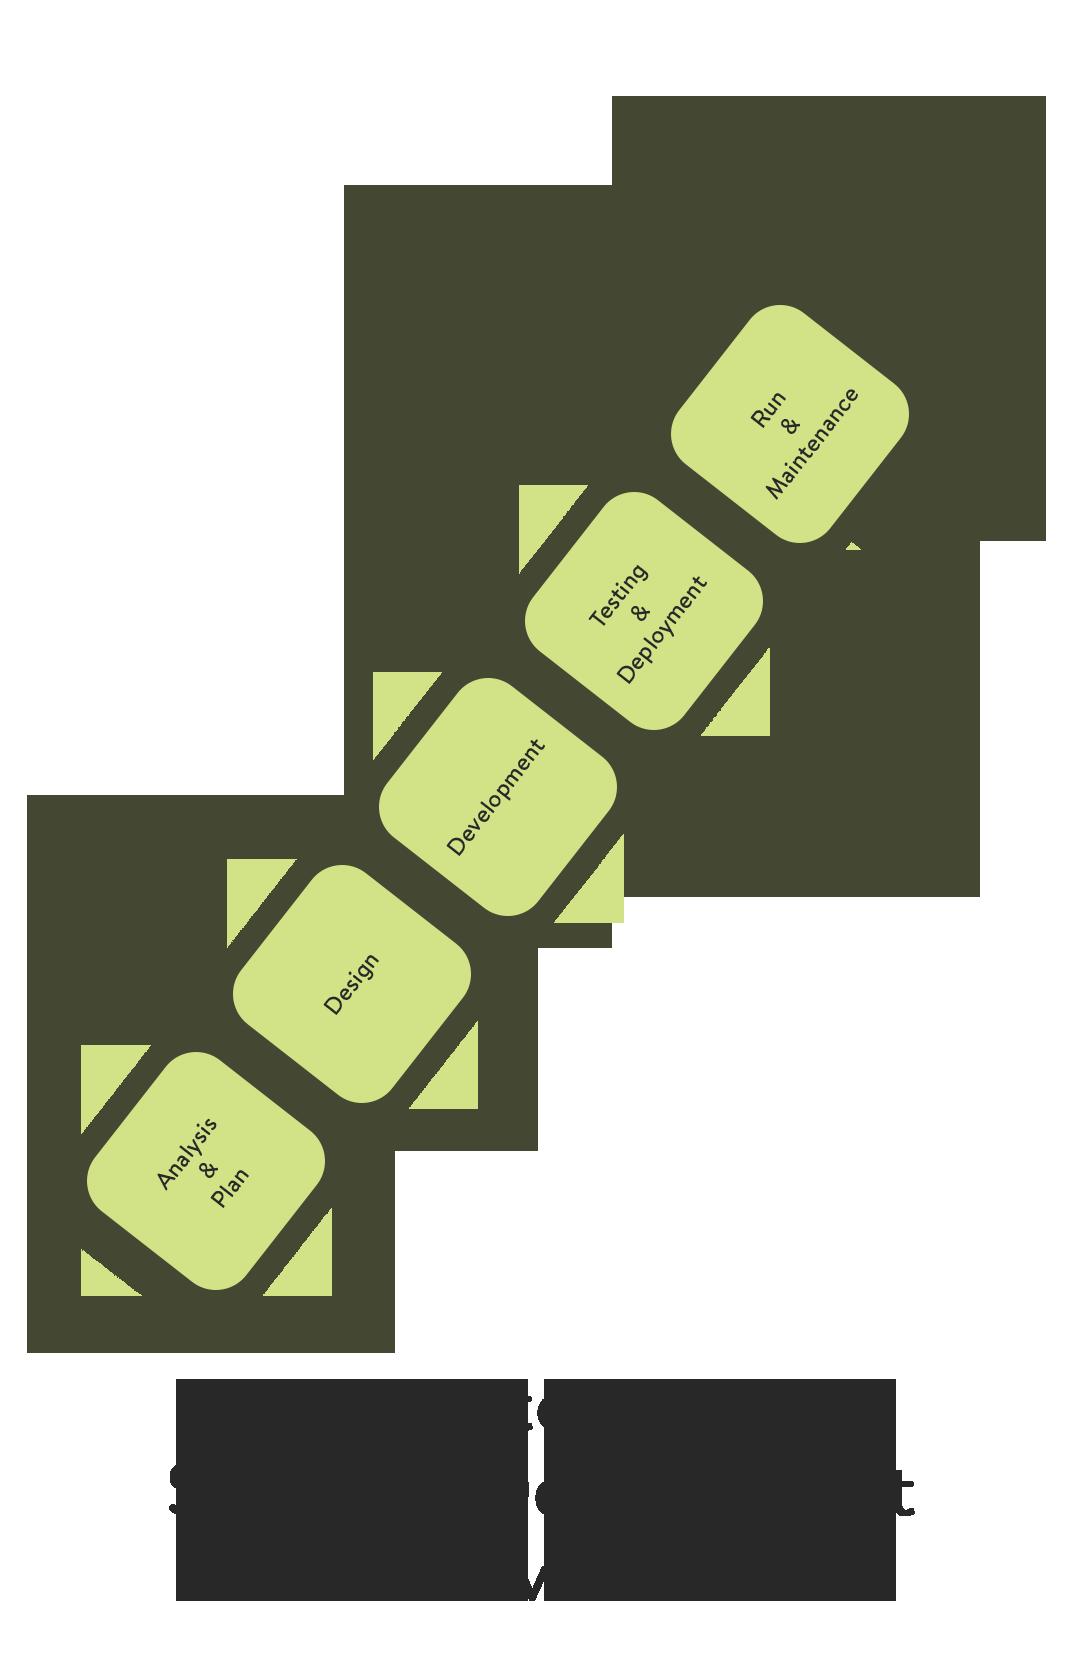 software-development-mci-image